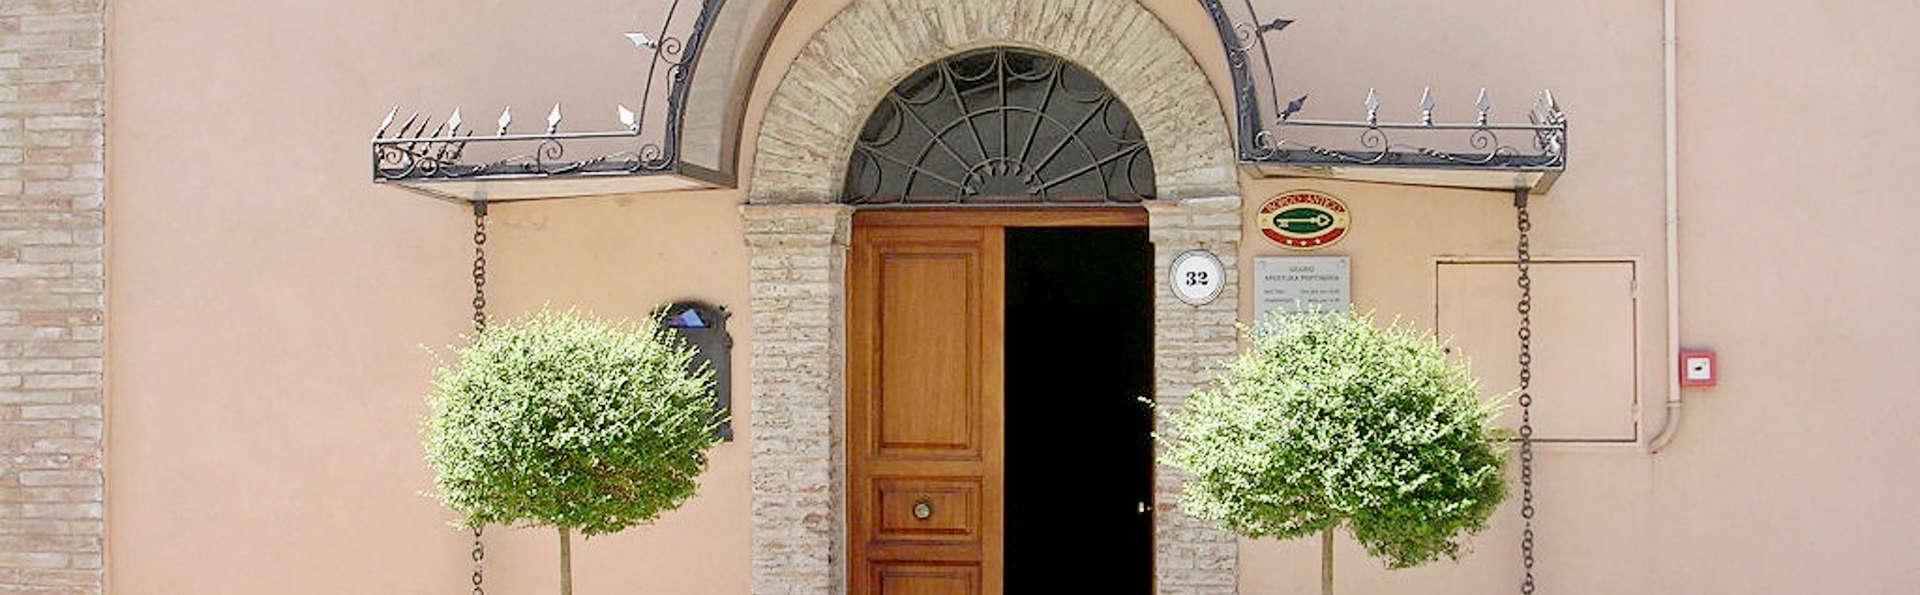 Hotel Borgo Antico - Edit_Front2.jpg